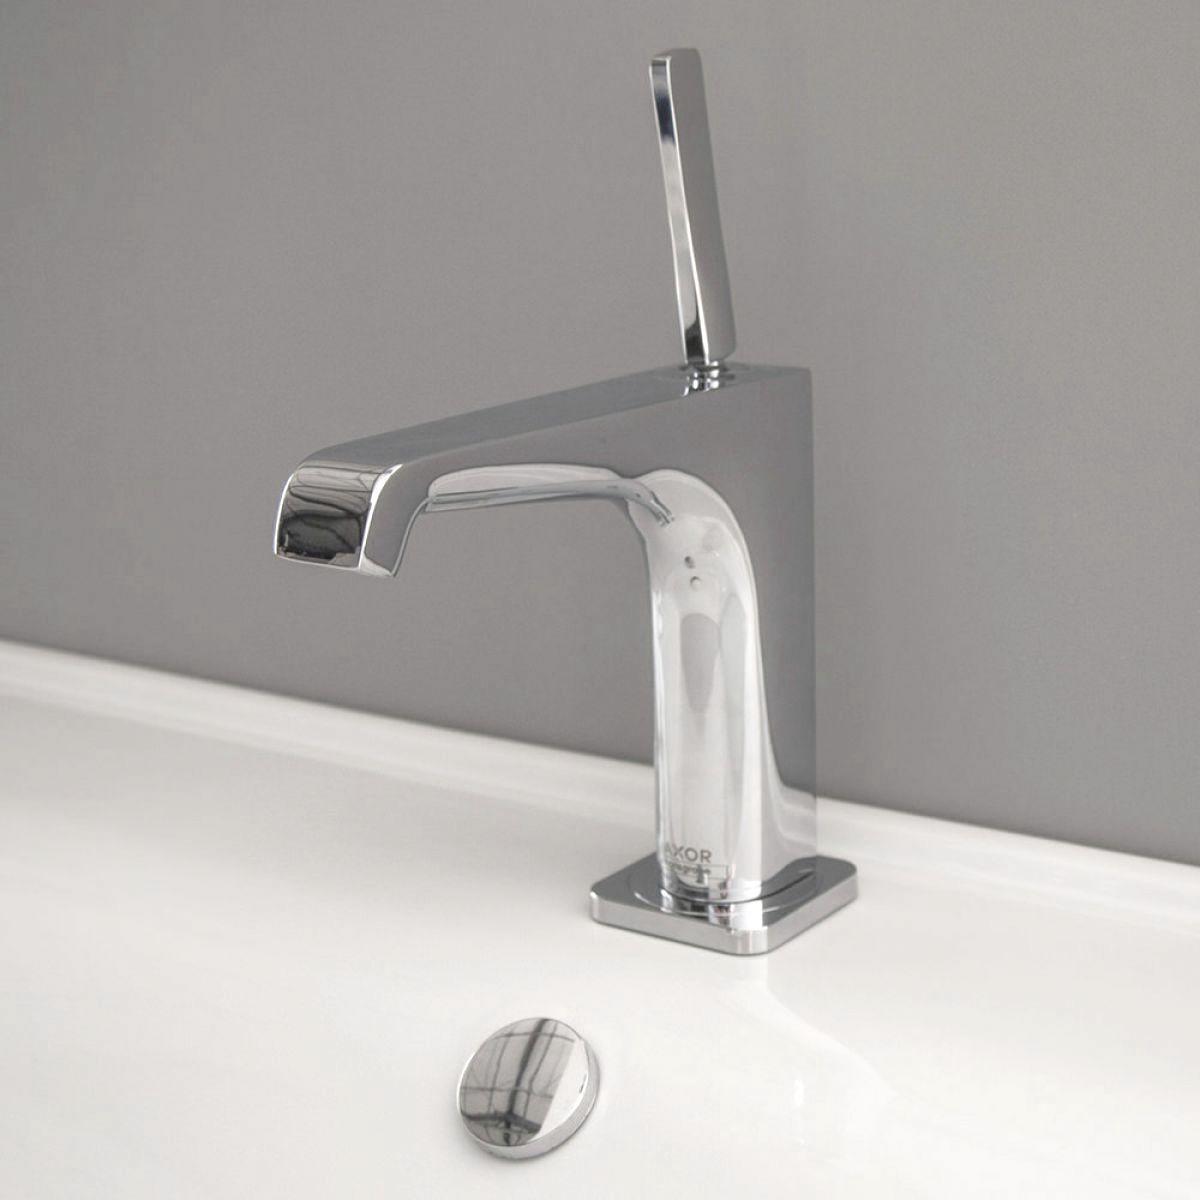 axor citterio e 125 basin mixer tap with joystick uk. Black Bedroom Furniture Sets. Home Design Ideas